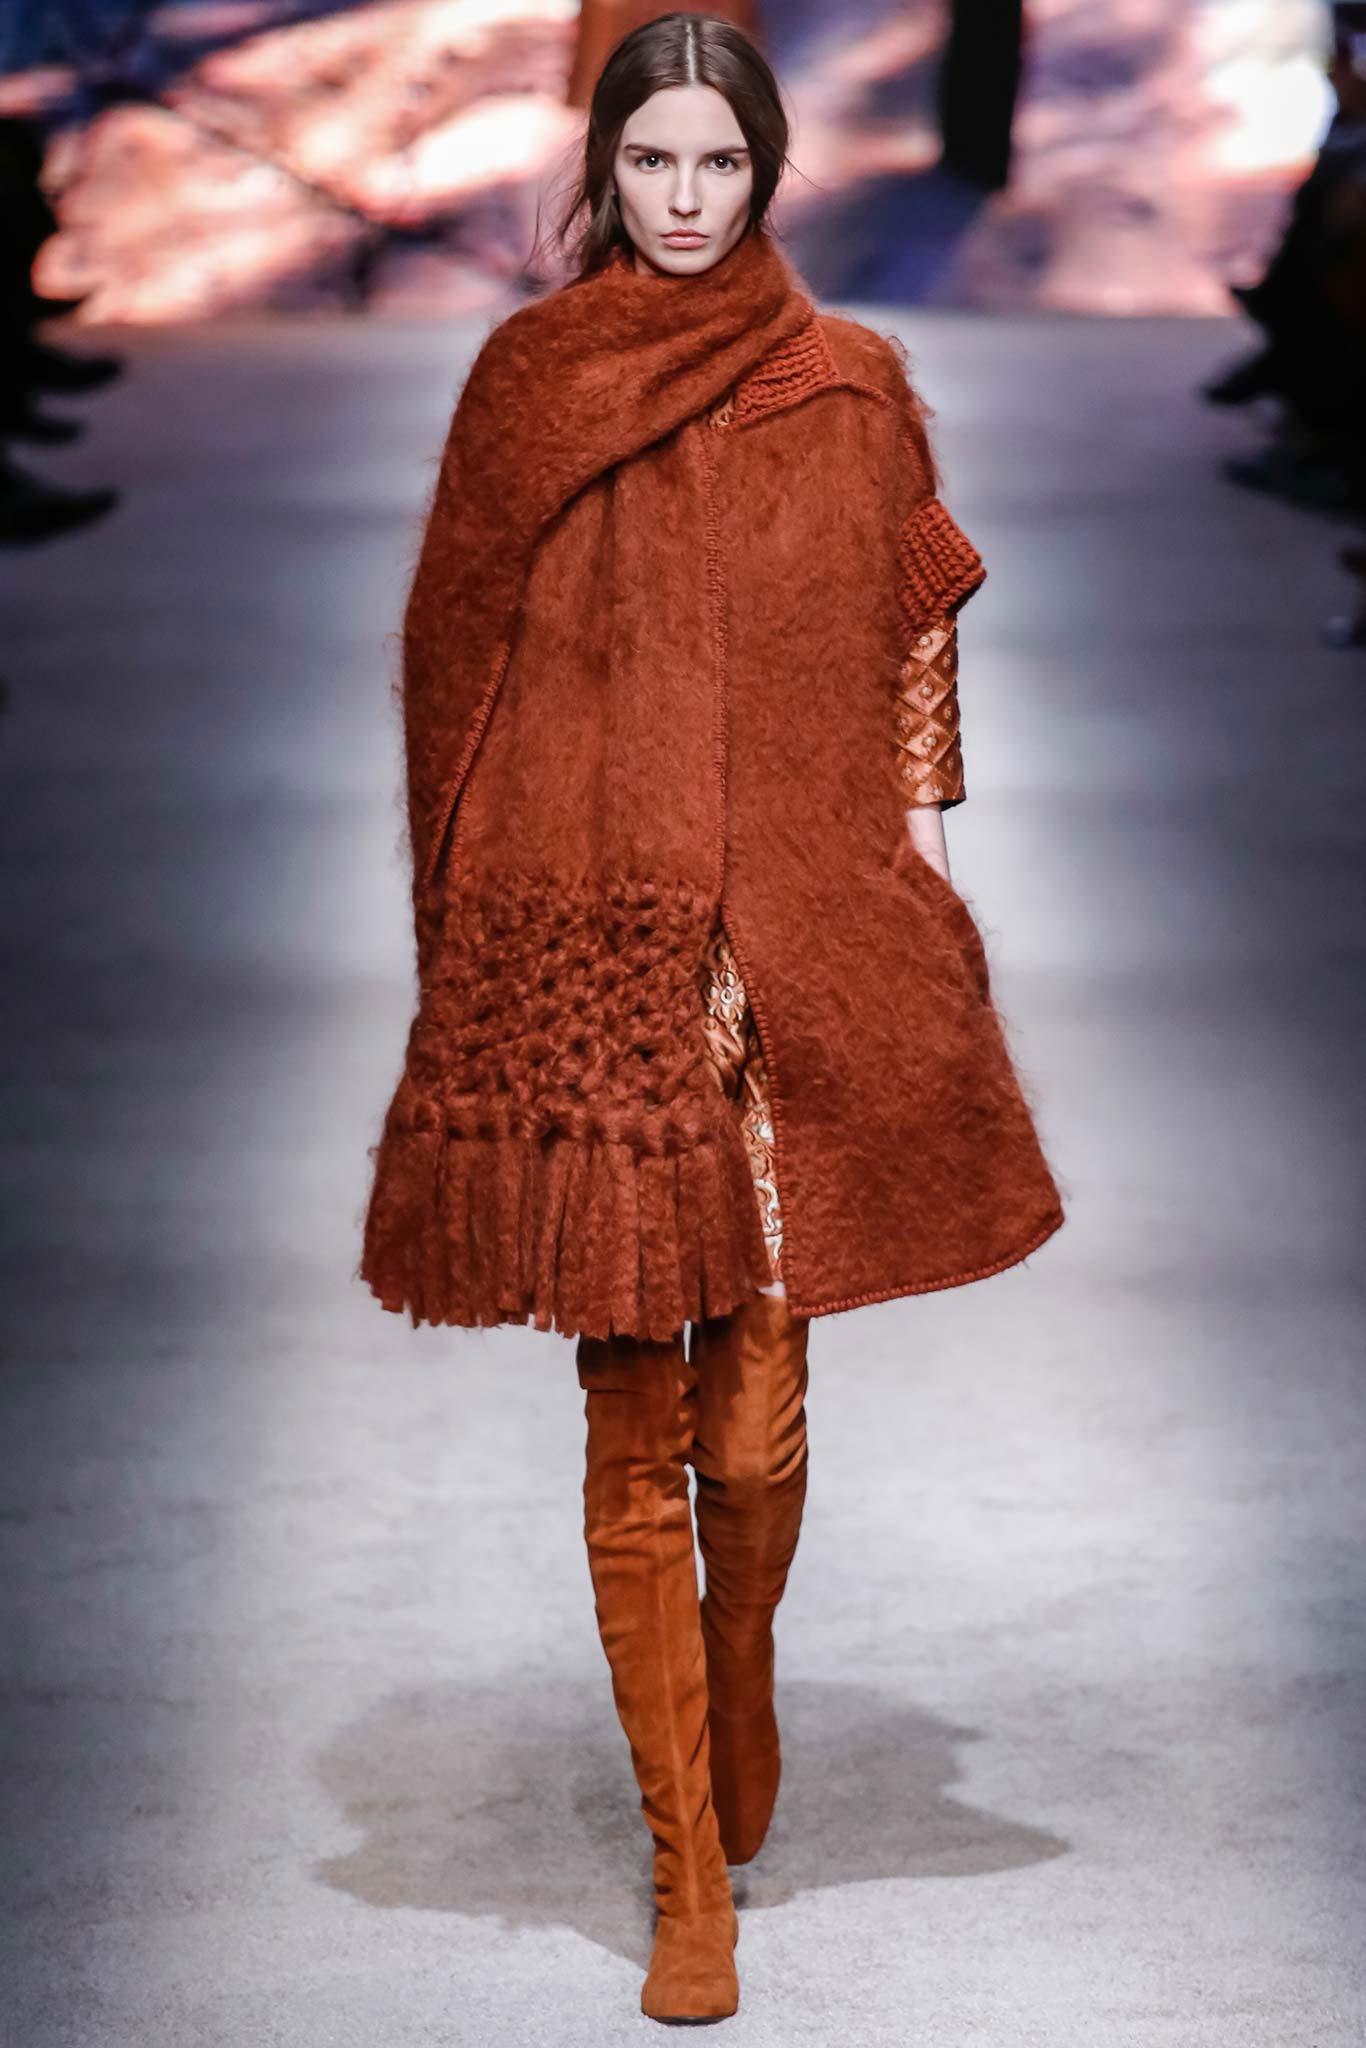 samye-krutye-modnye-tendencii-sezona-osen'-zima-38